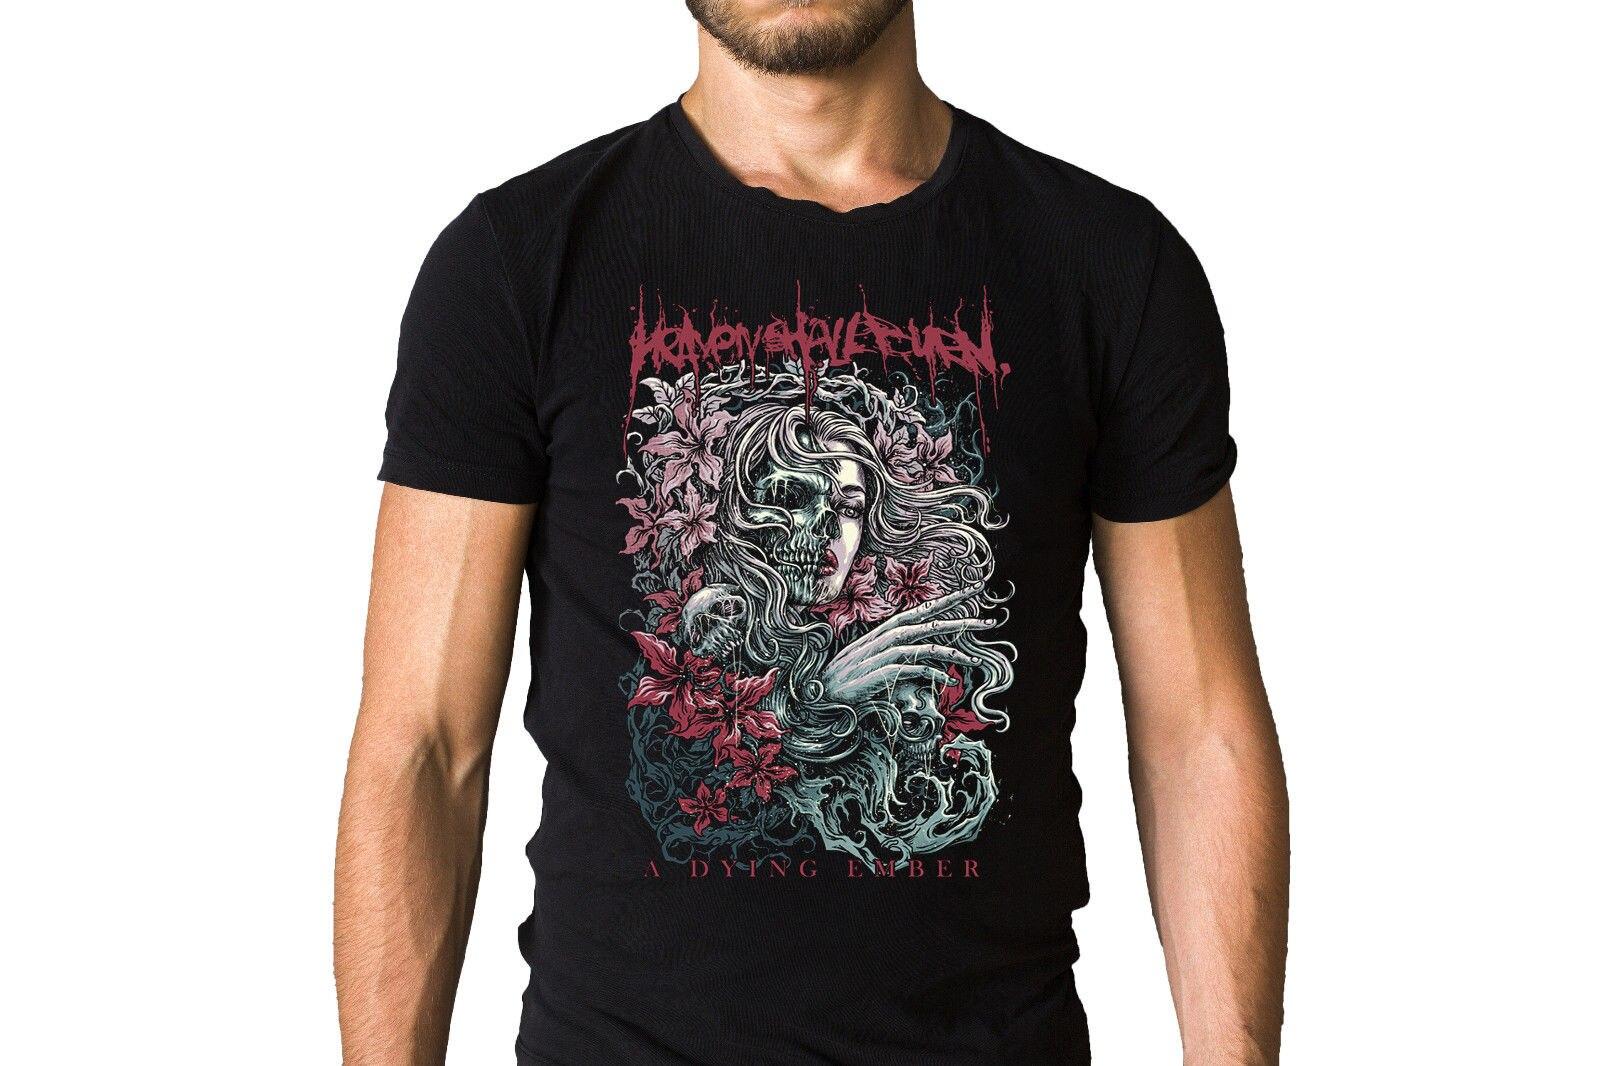 Heaven Shall Burn A Dying Ember Black T-Shirt Hot 2018 Summer MenS T Shirt Fashion Short Sleeve Summer Style